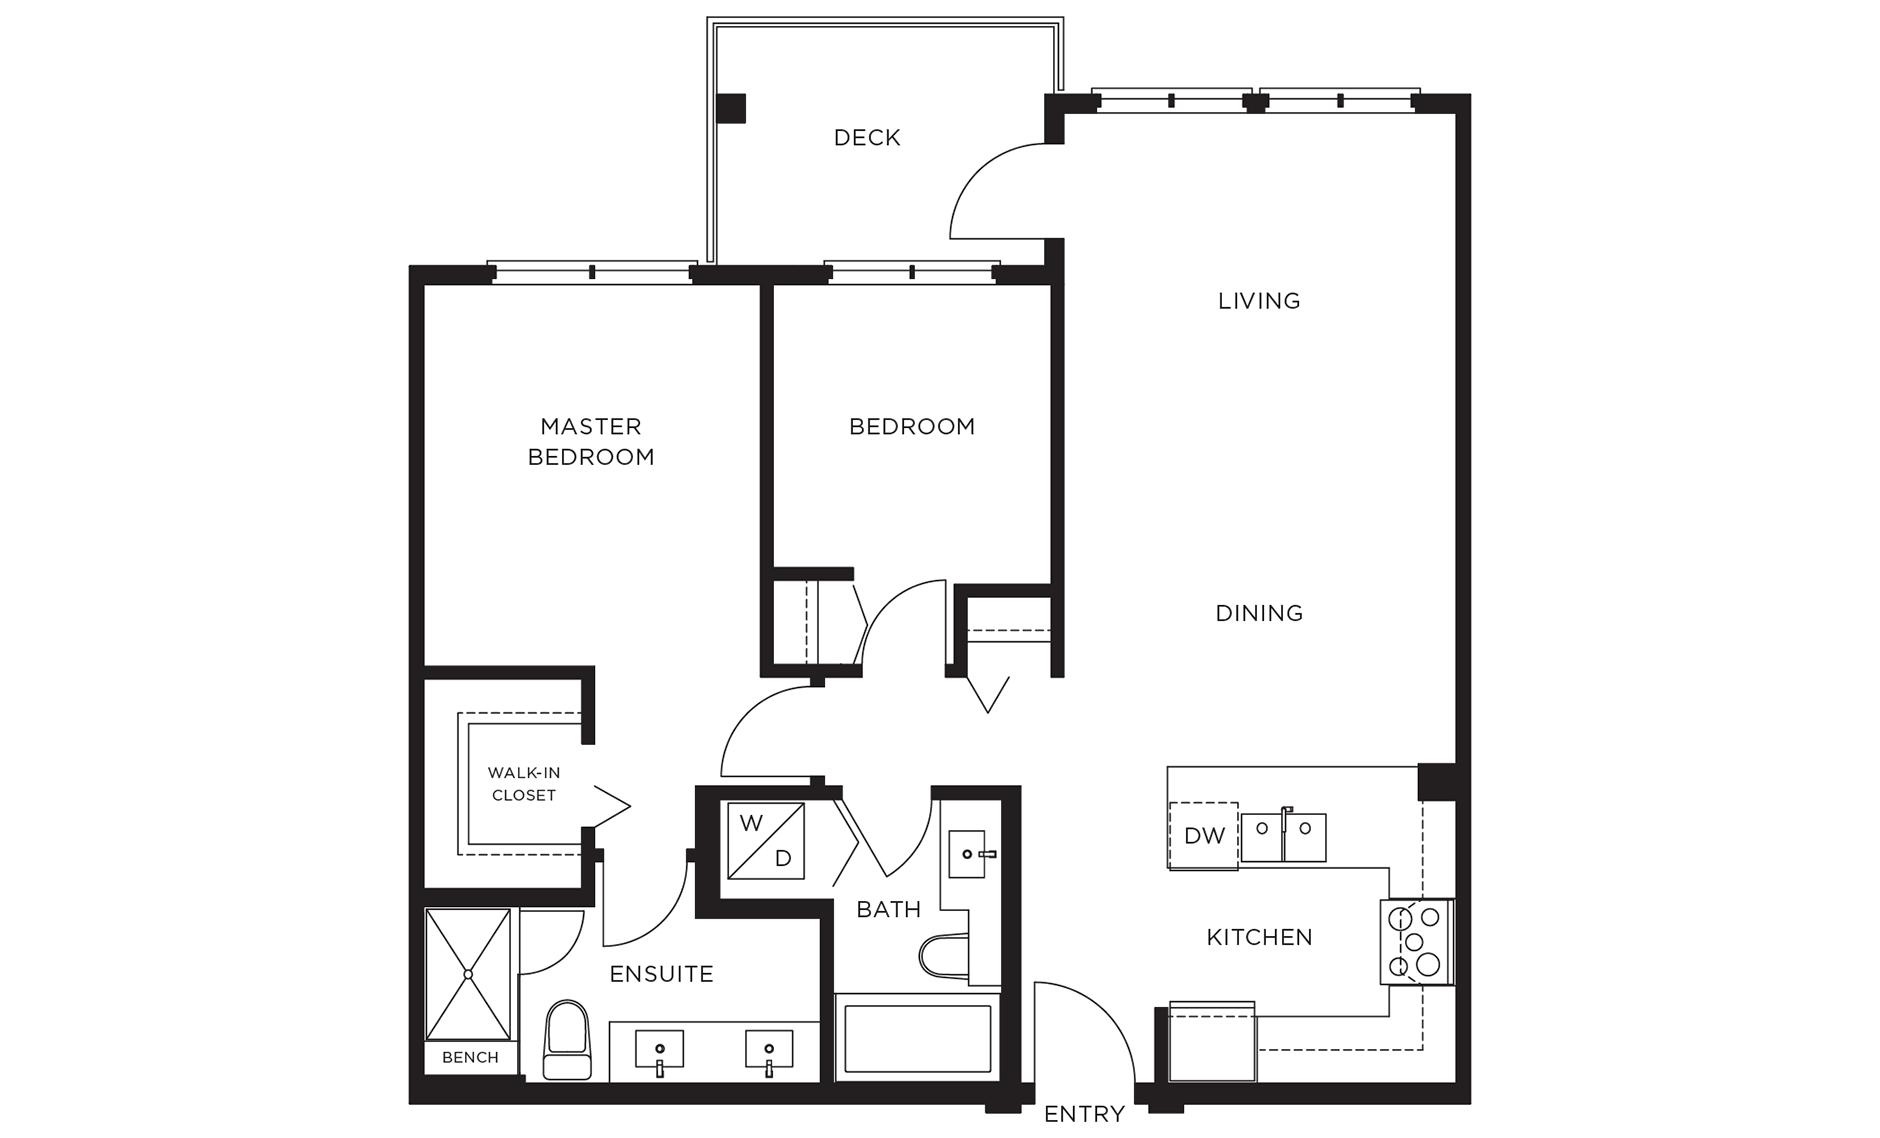 stanton_house_floorplan_C_1880x1138 Stanton Home Design on garrison home design, cobb home design, tranquility home design,